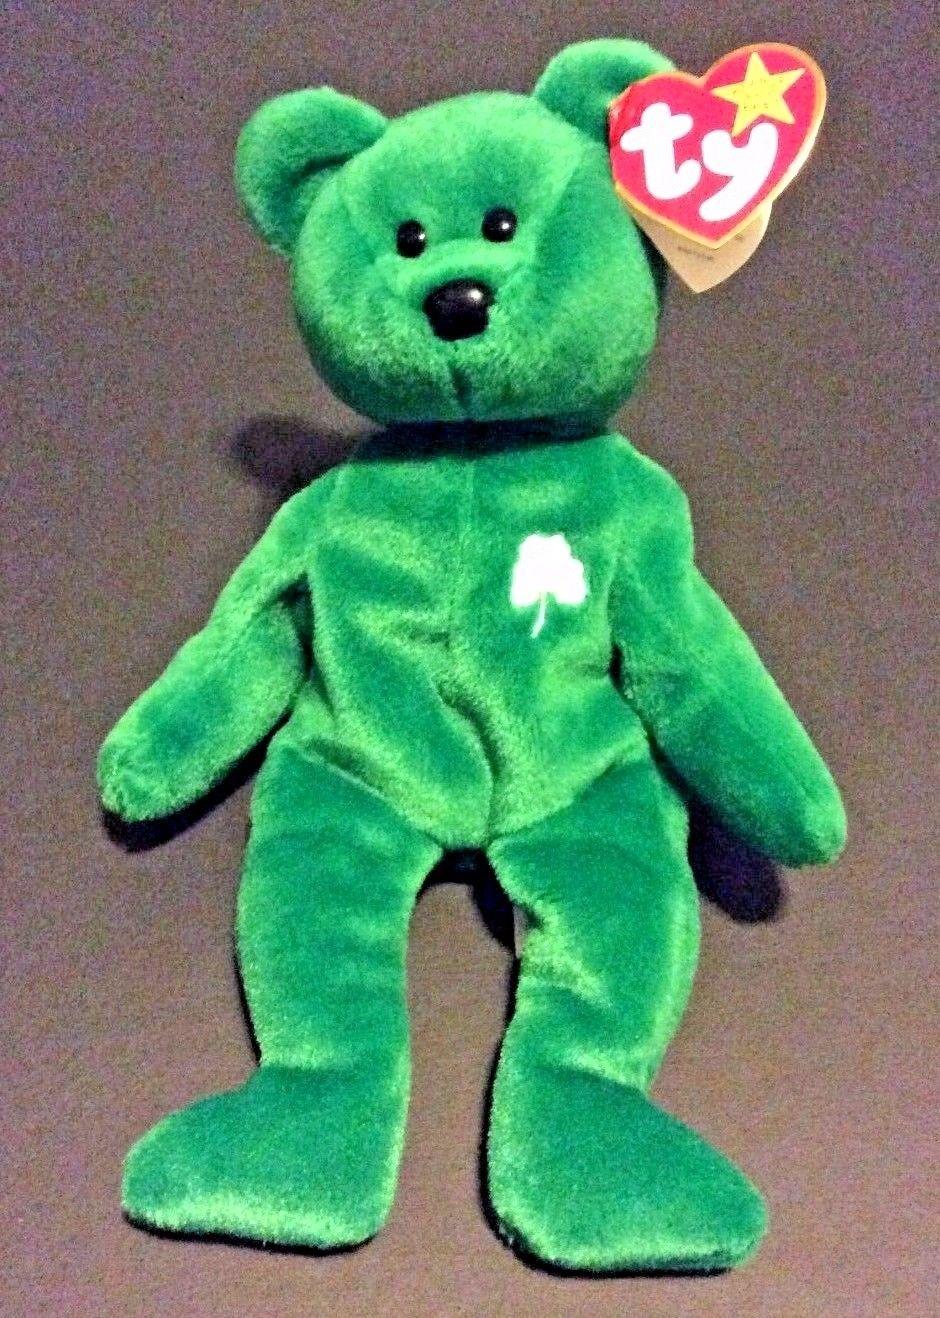 da57f7fb3a1 S l1600. S l1600. Ty Beanie Babies Retired 1997 Erin Shamrock Green Bear. Ty  Beanie Babies Retired ...